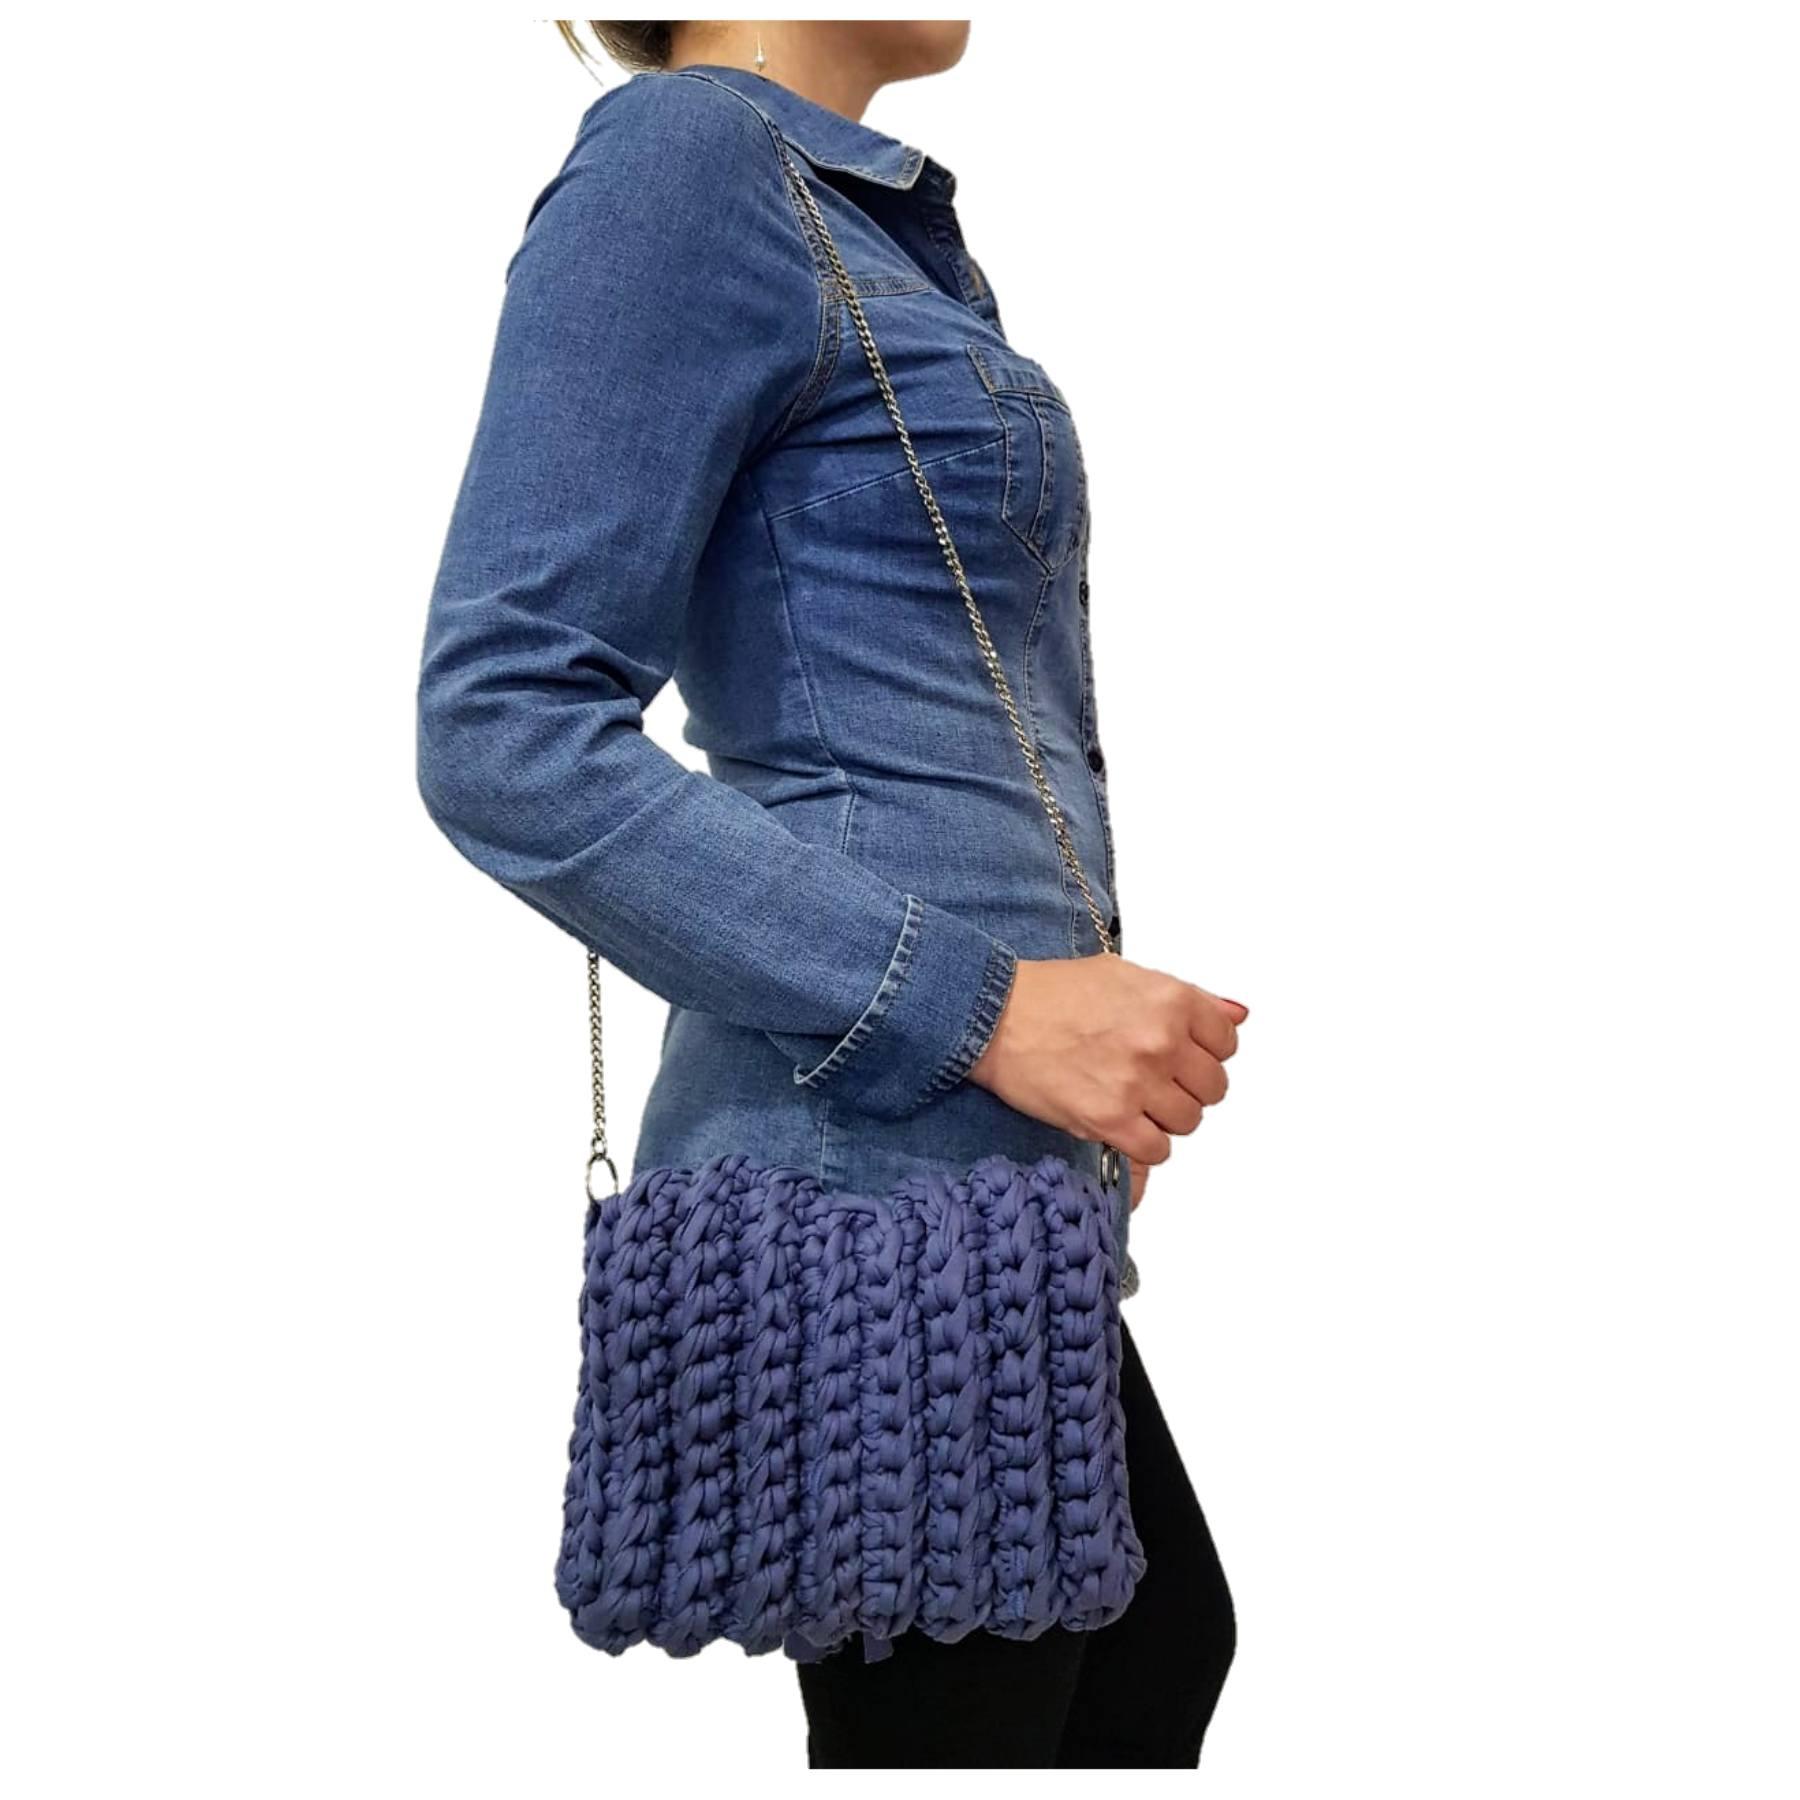 Bolsa Feminina Transversal SapatoWeb Crochê Algodão Azul  - SAPATOWEB.COM